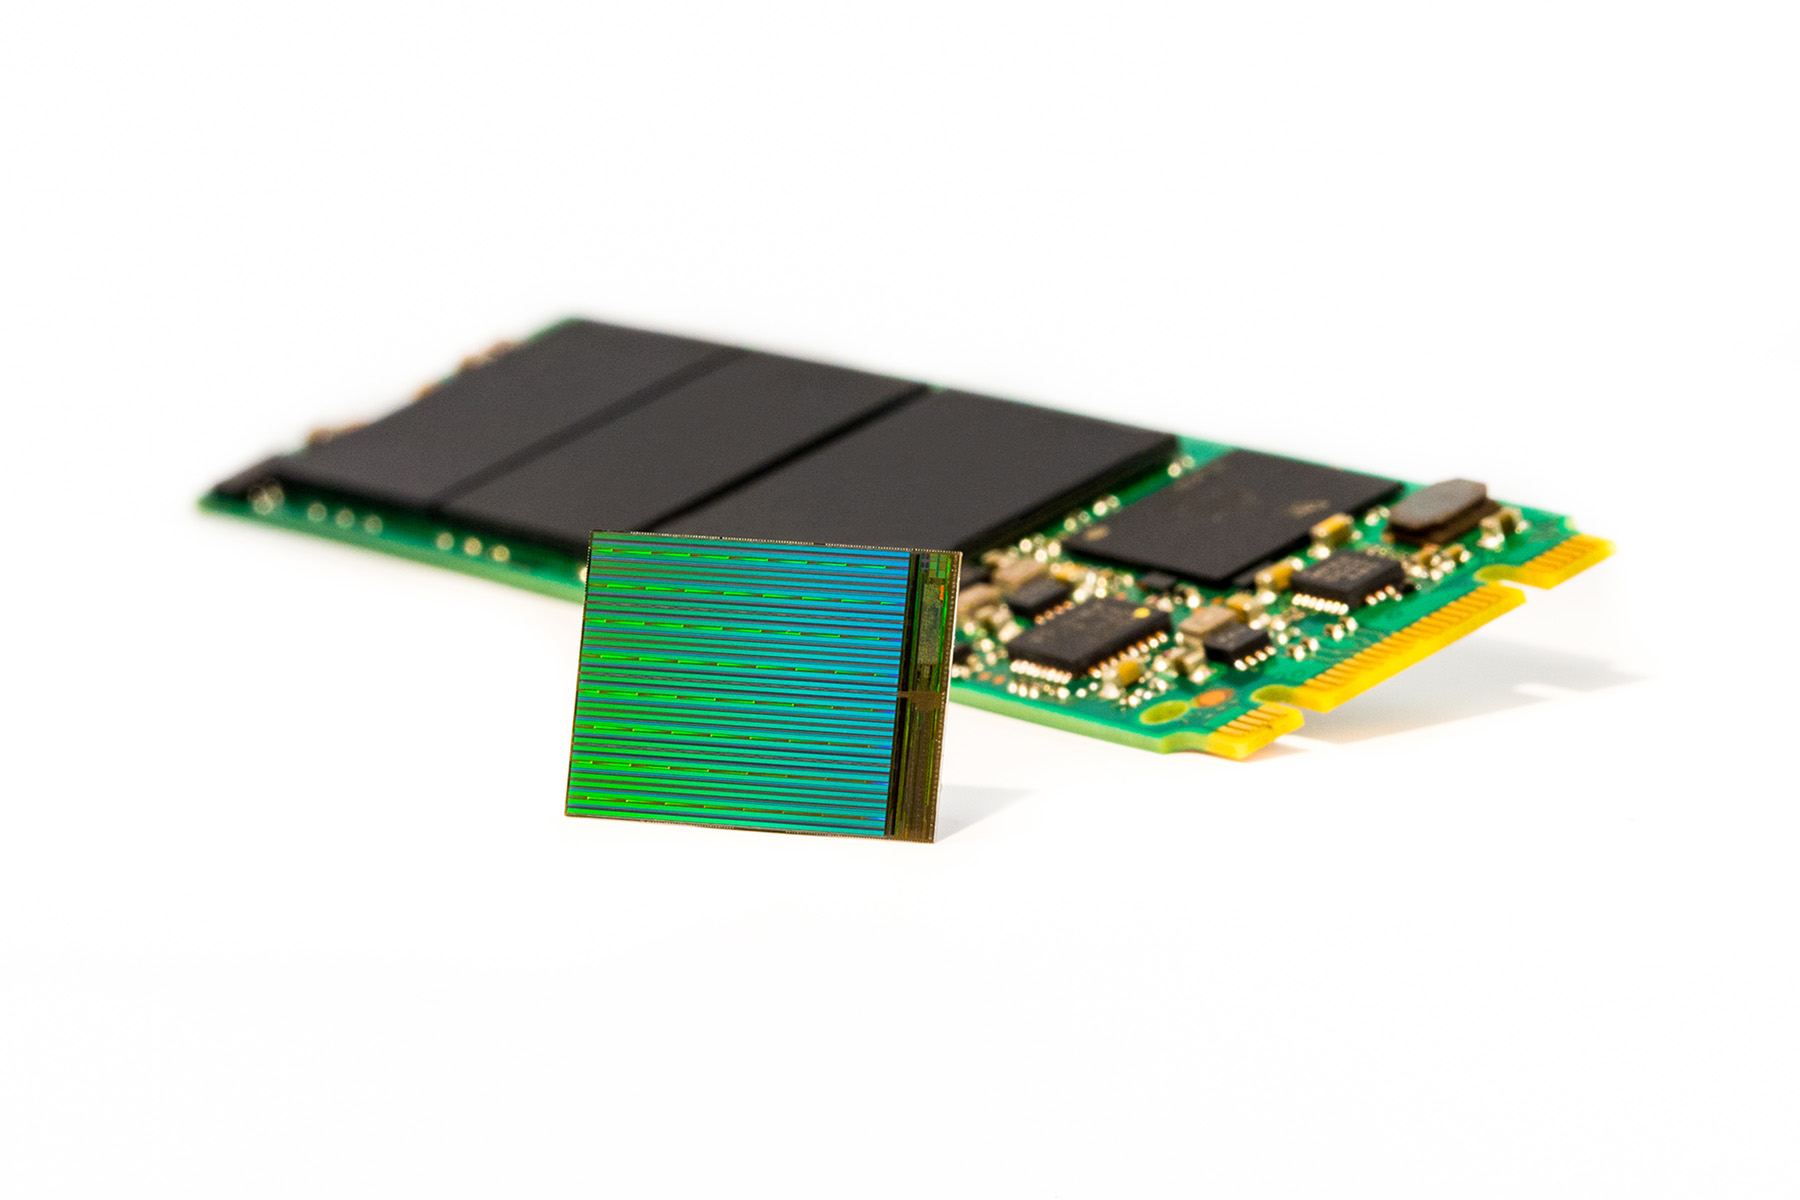 3D+NAND+Die+with+M2+SSD.jpg